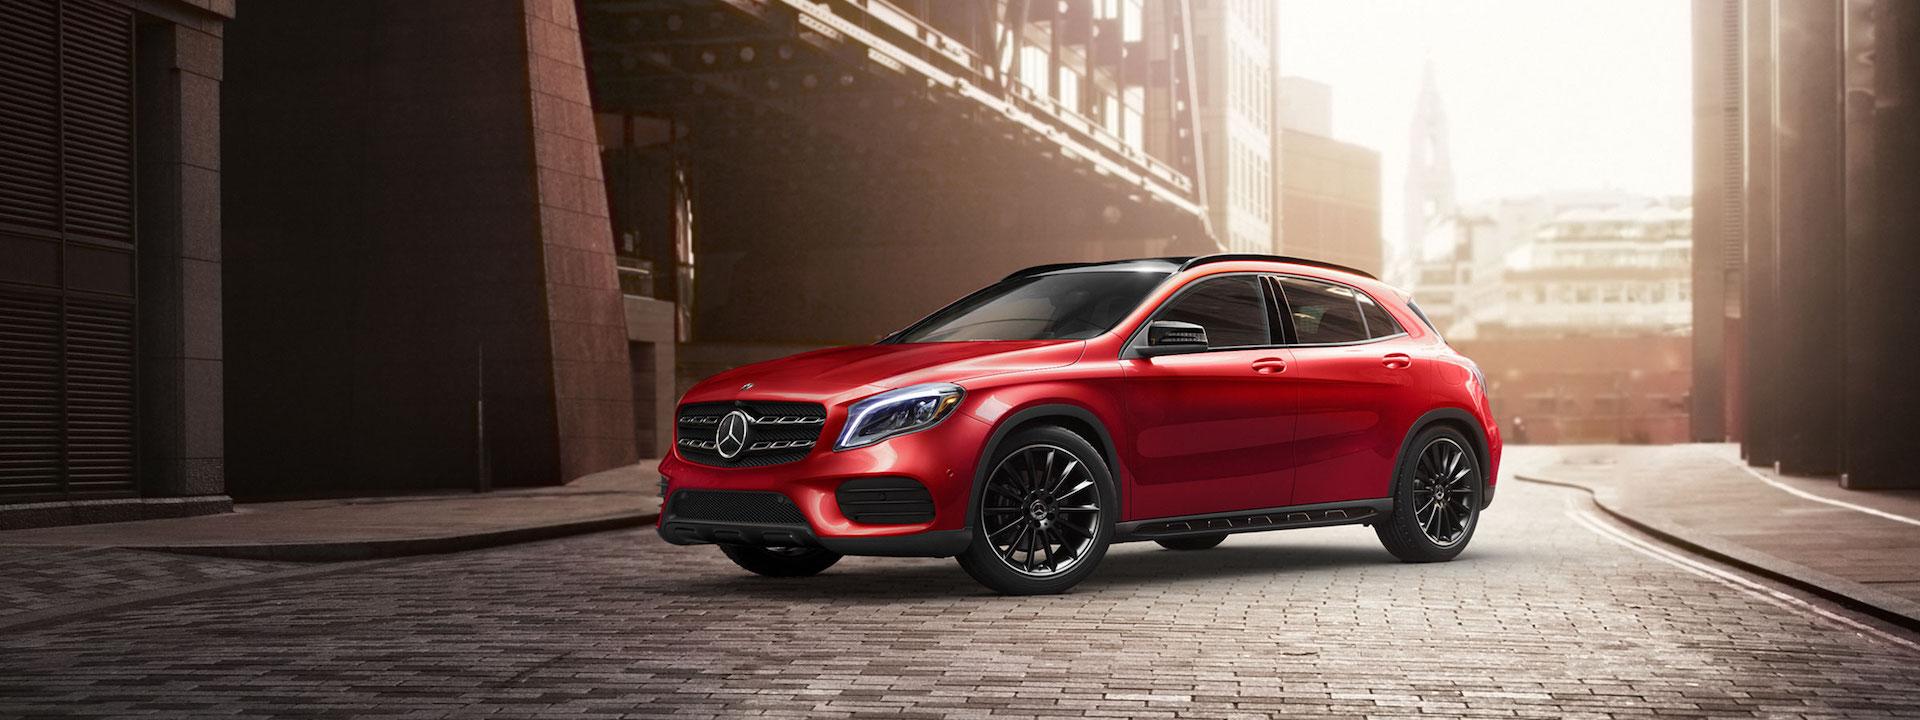 2020 Mercedes-Benz GLA SUV | ZT Motors of Fort Walton Beach